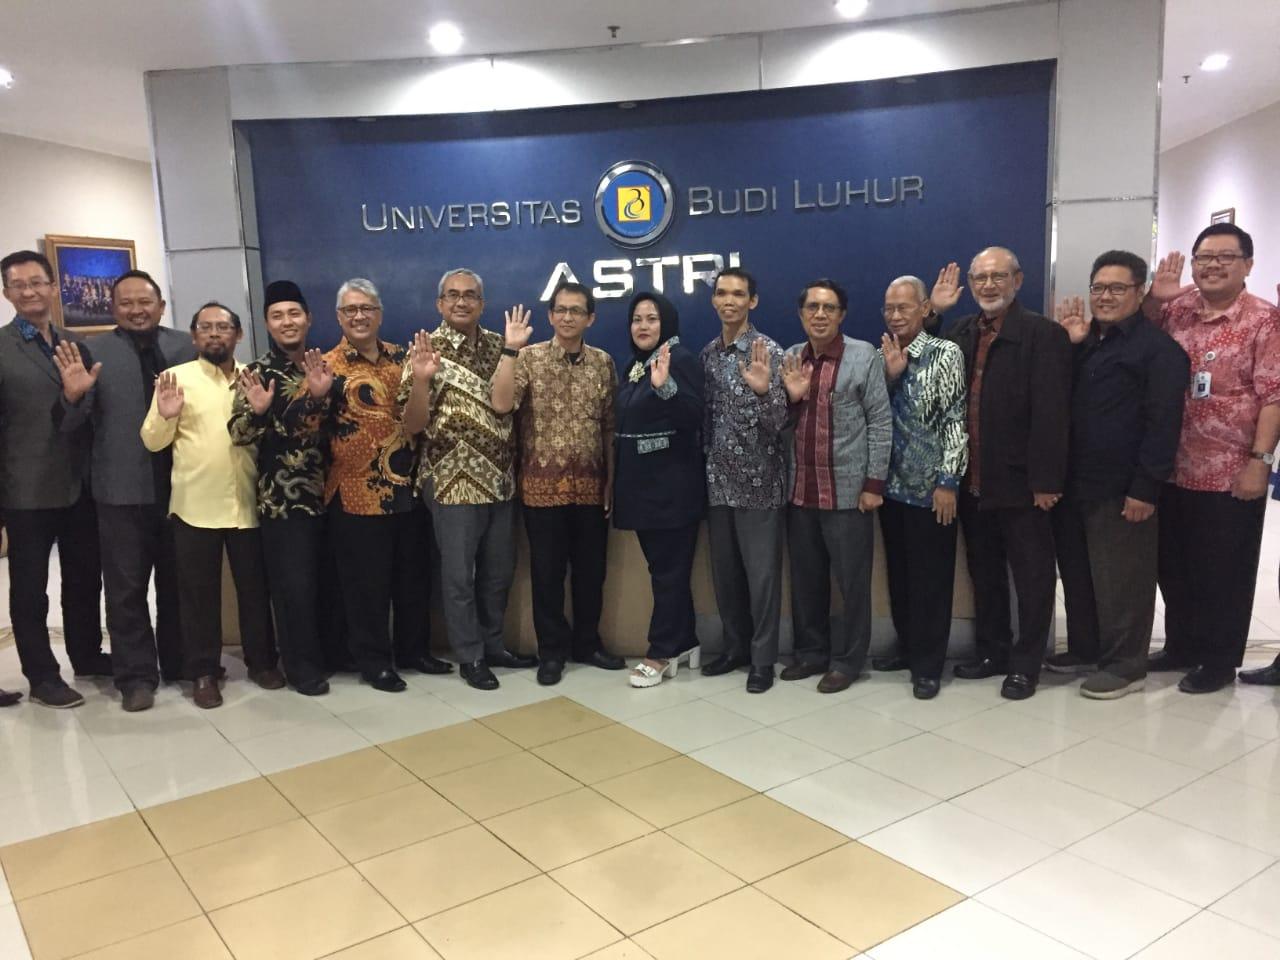 Yayasan Budi Luhur Sakti melakukan penandatanganan Memorandum of Understanding (MoU) bersama Yayasan Pambudi Luhur dan Yayasan Cahaya Ilmu Cimahi (YCIC)